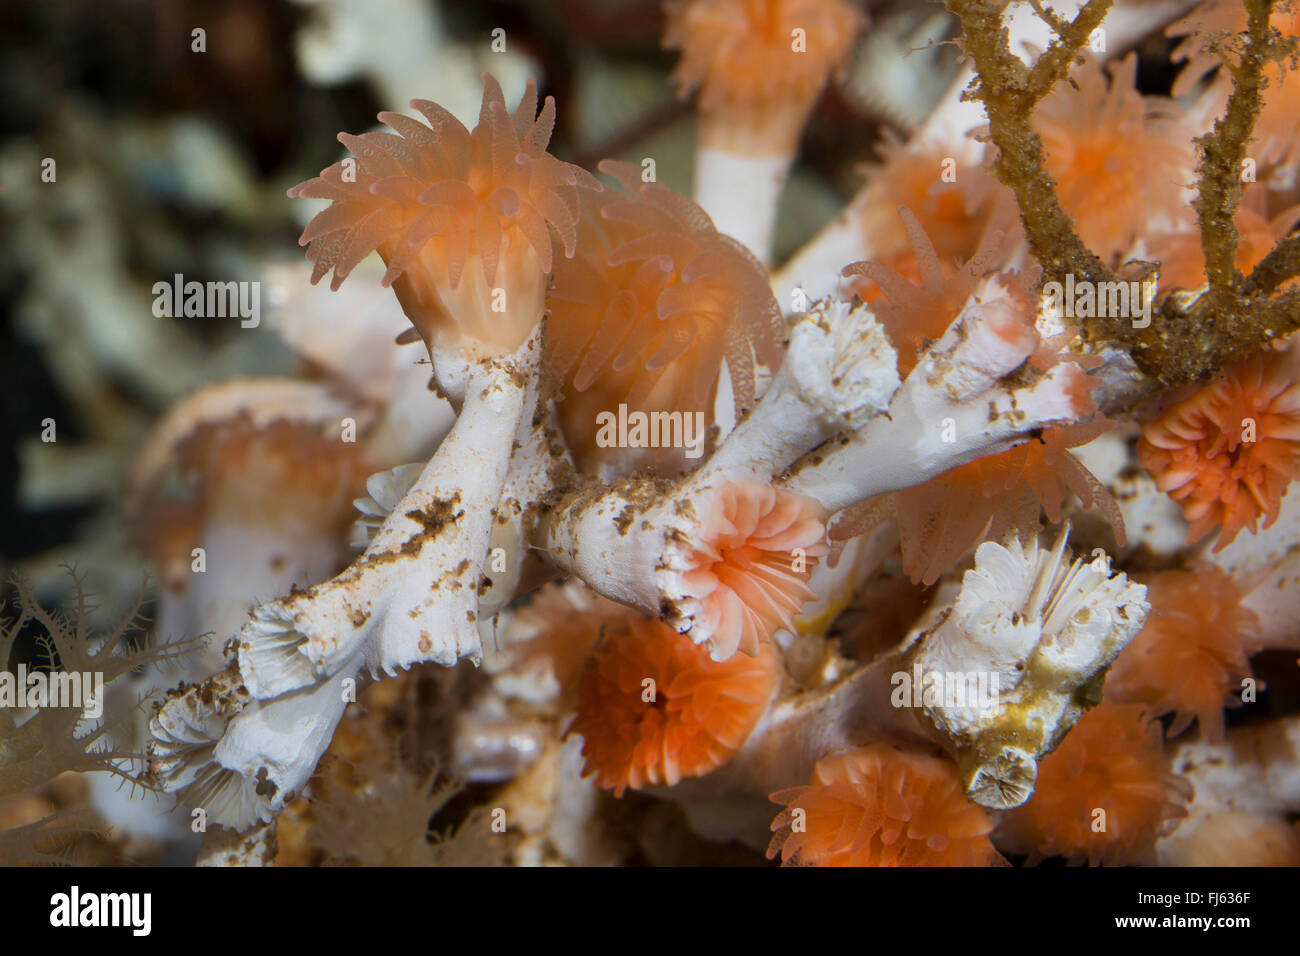 eye coral, cold-water coral, spider hazards (Lophelia pertusa, Madrepora pertusa), close-up view - Stock Image